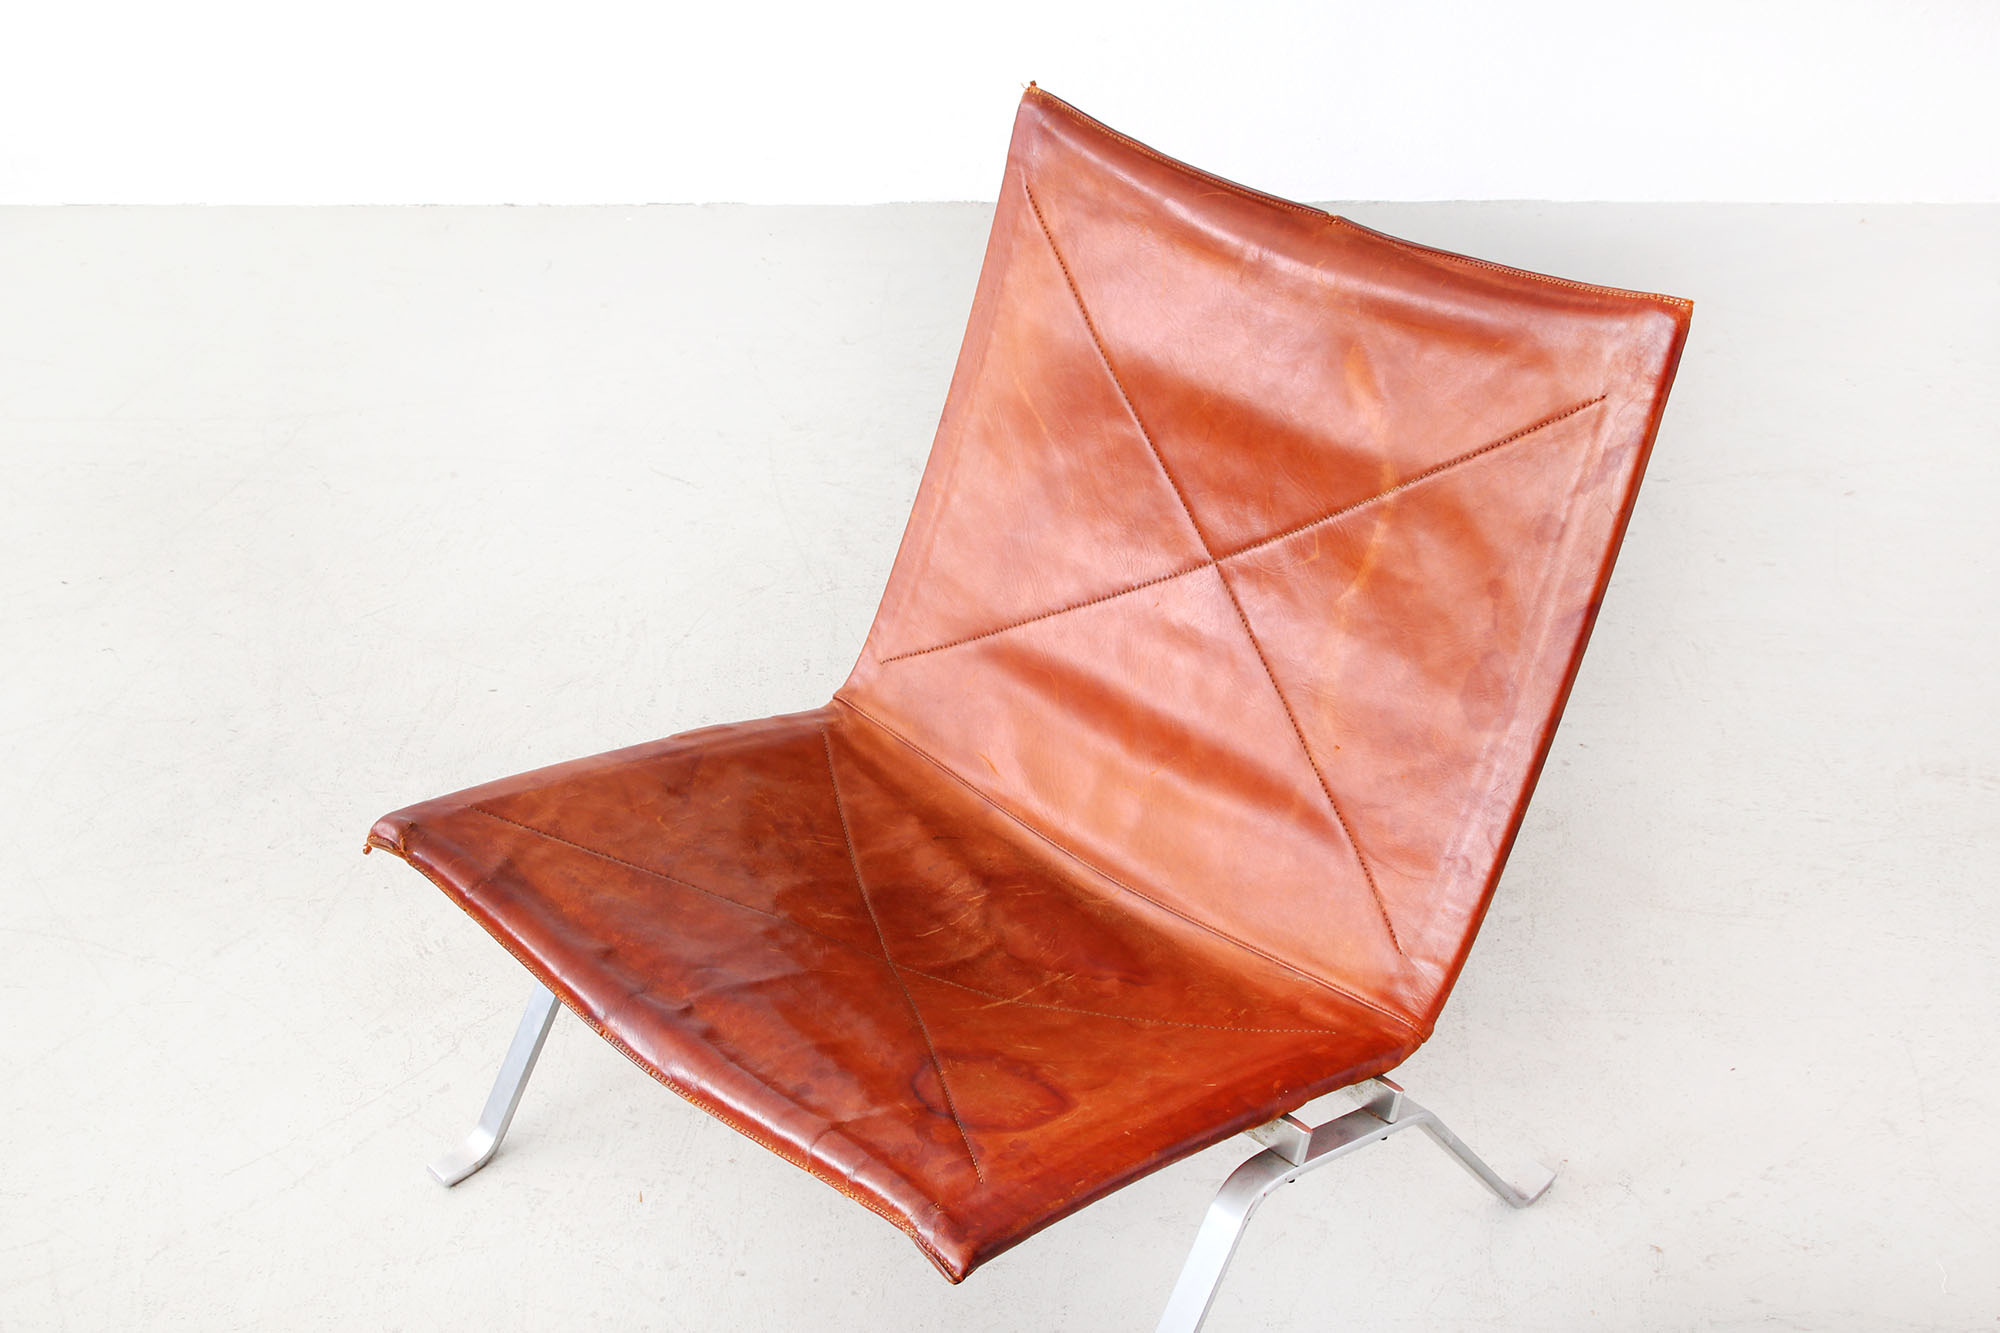 Galerie Bachmann Lounge Chairs PK22 by Poul Kjaerholm for E